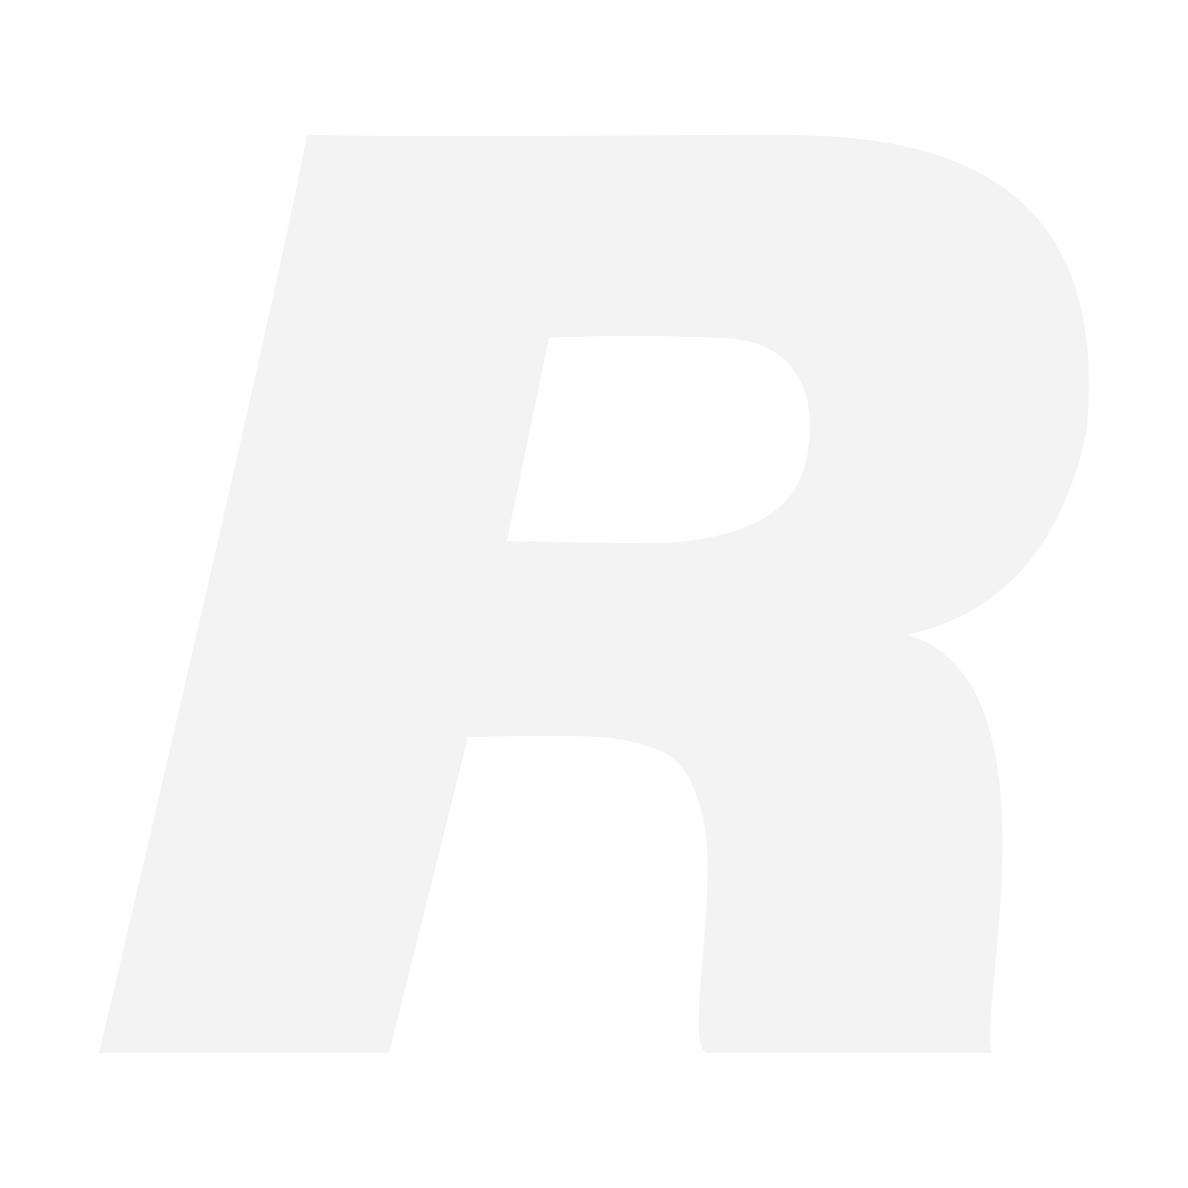 Spyder 5 Pro -kalibrointilaite